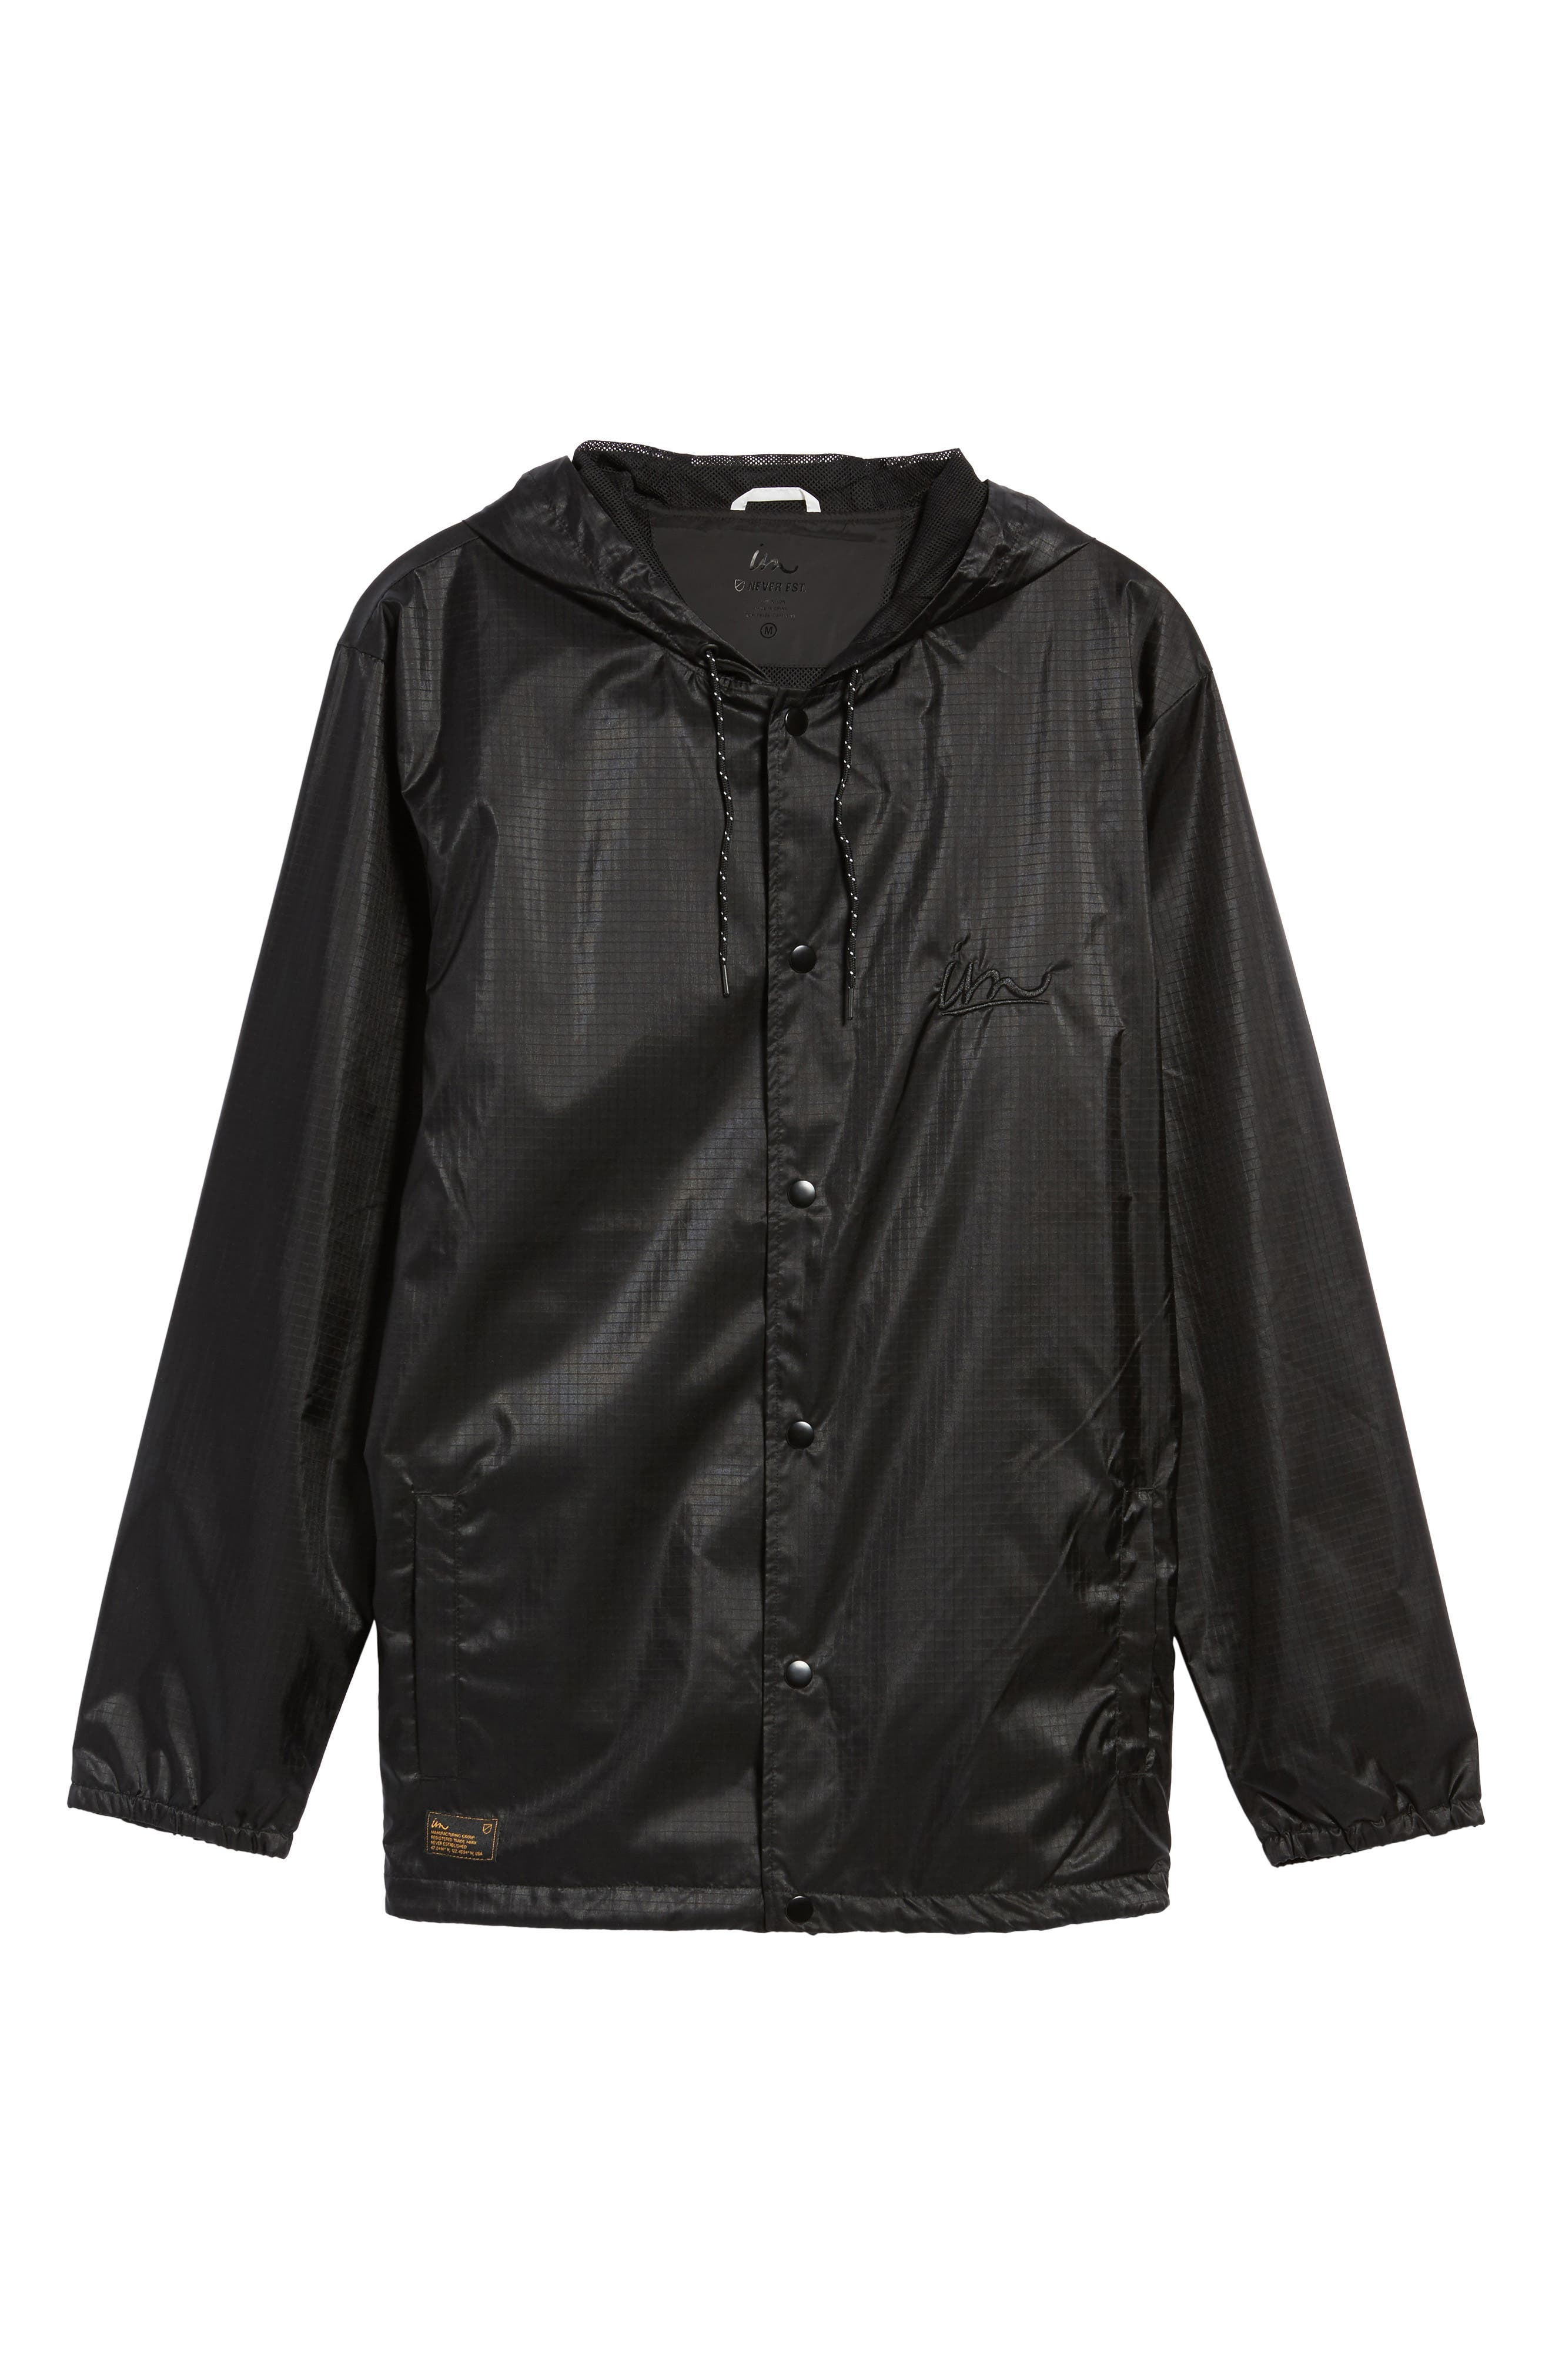 NCT Vulcan Coach's Jacket,                             Alternate thumbnail 3, color,